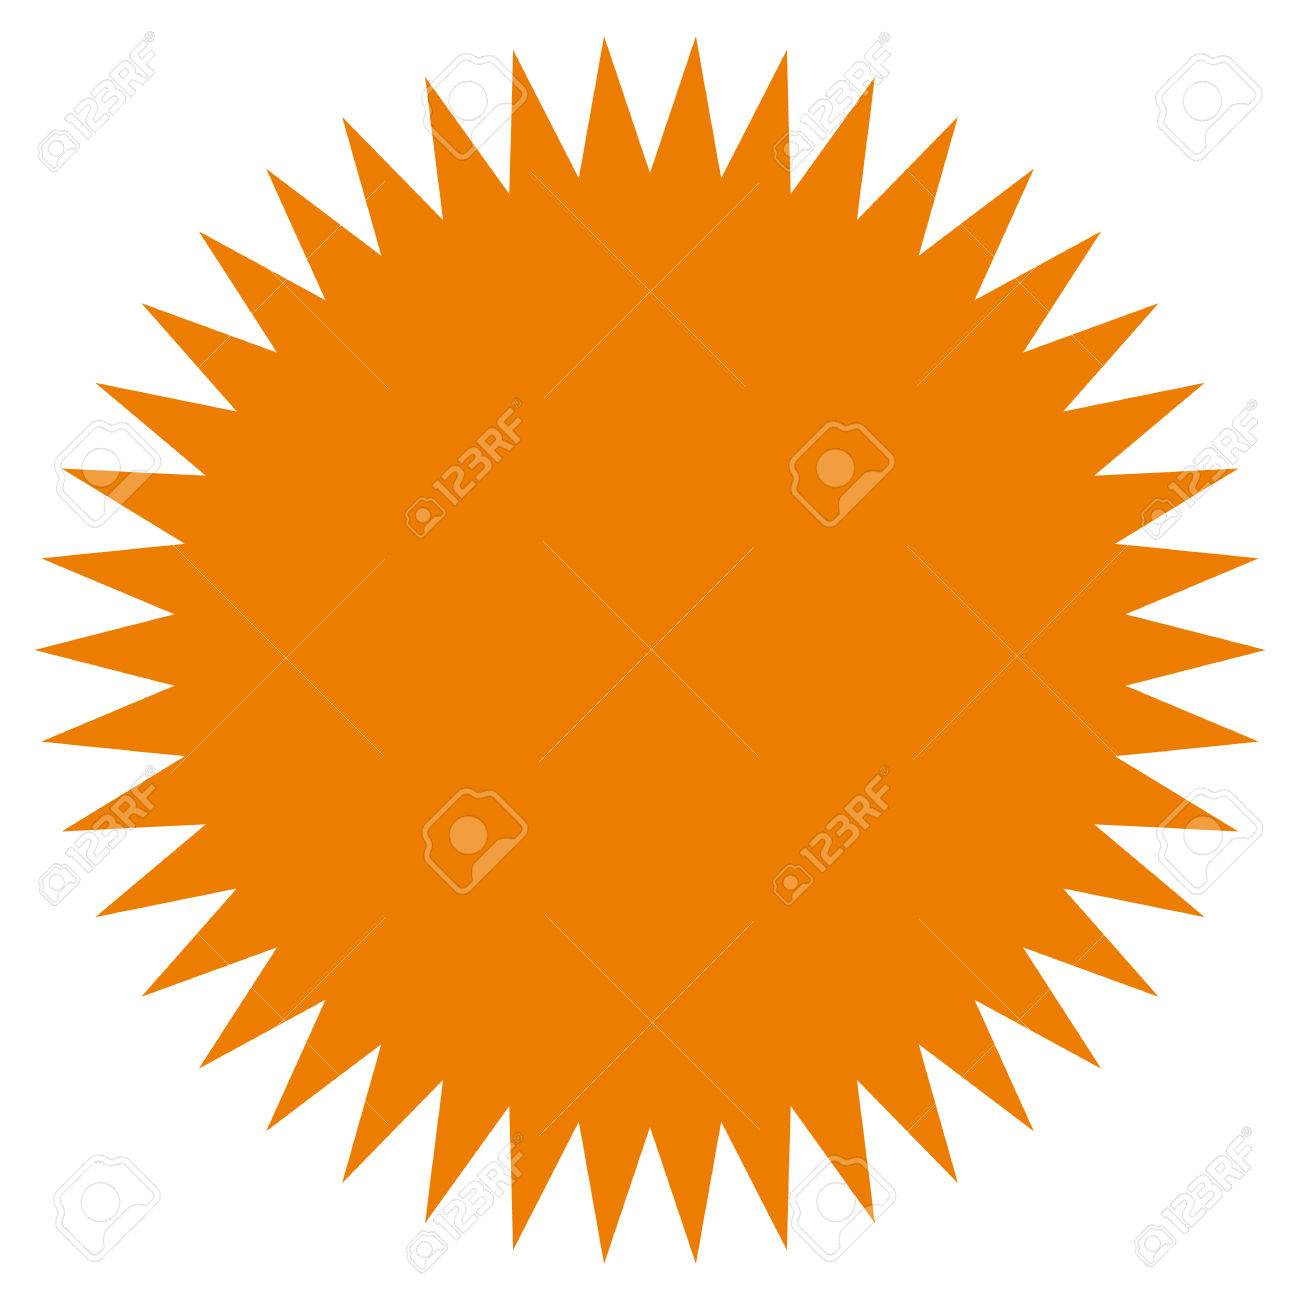 starburst sunburst shape flat price tag price flash icon royalty rh 123rf com sunburst vector illustrator sunburst vector psd